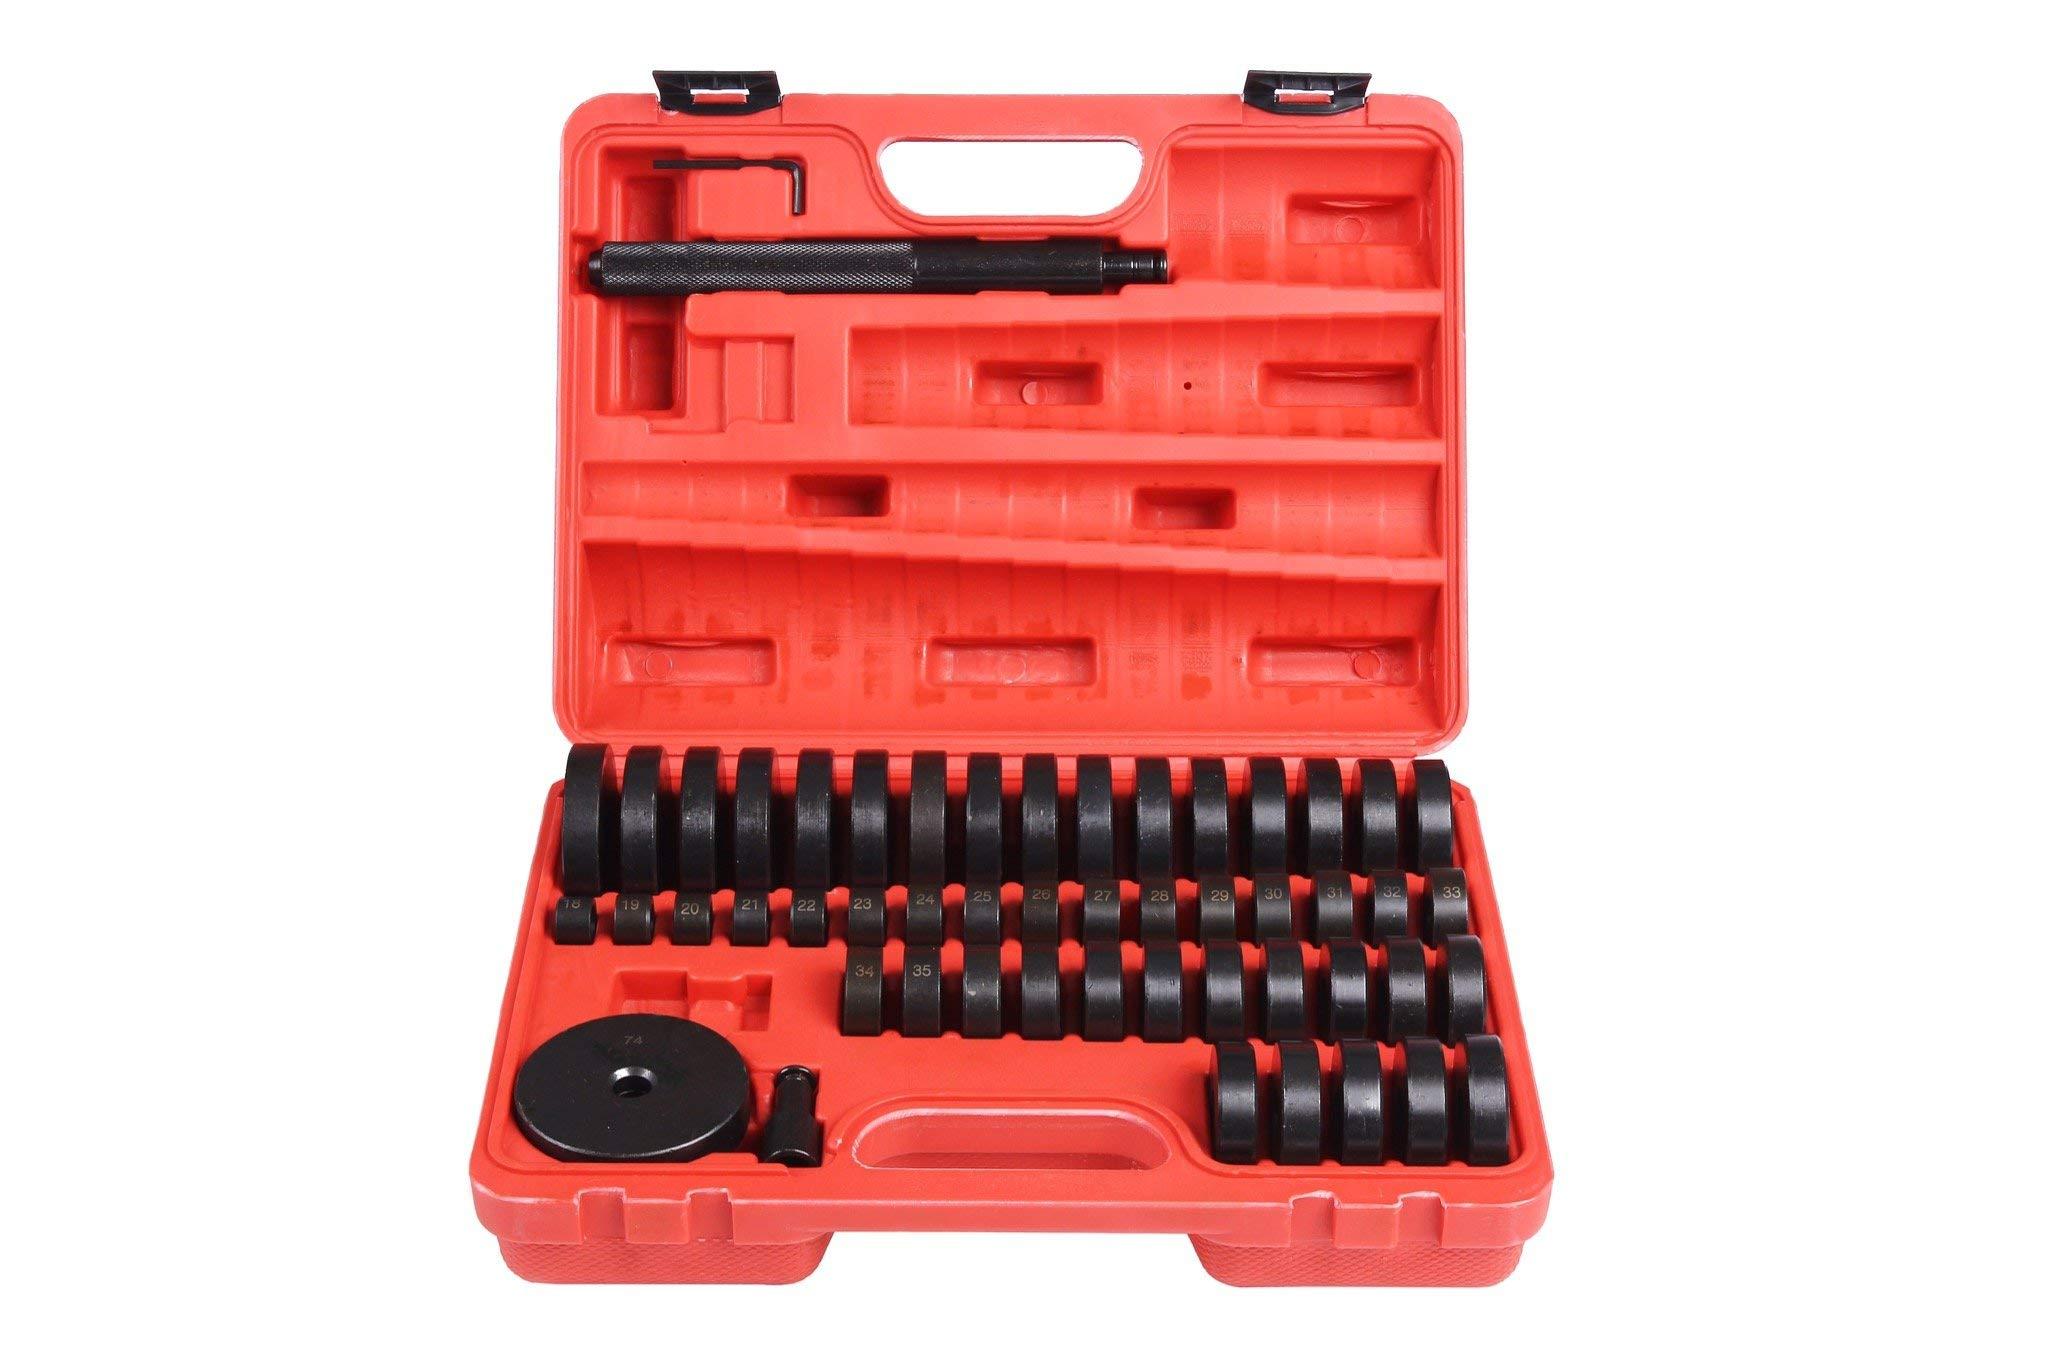 Shankly Bushing Removal Tool, Bushing Driver Set, 50 Piece Seal Drive Set (Renewed)